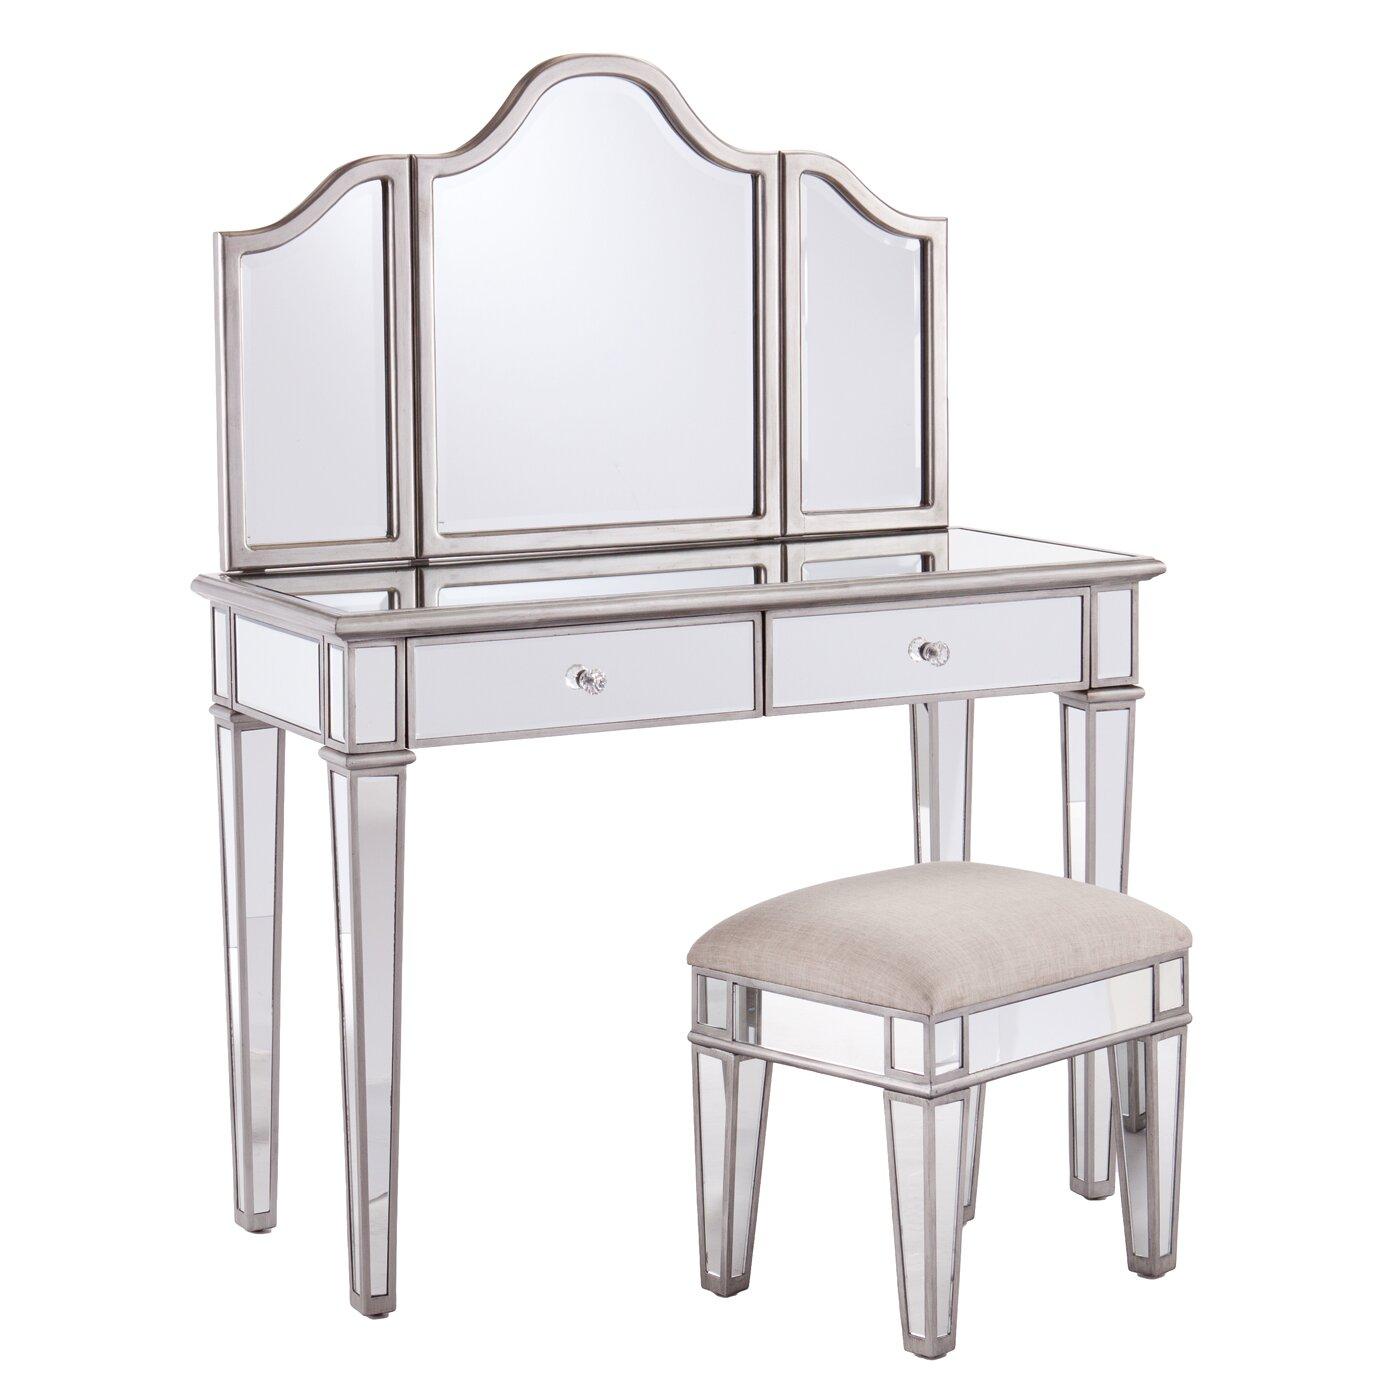 House Of Hampton 2 Piece Kaila Mirrored Vanity Stool Set